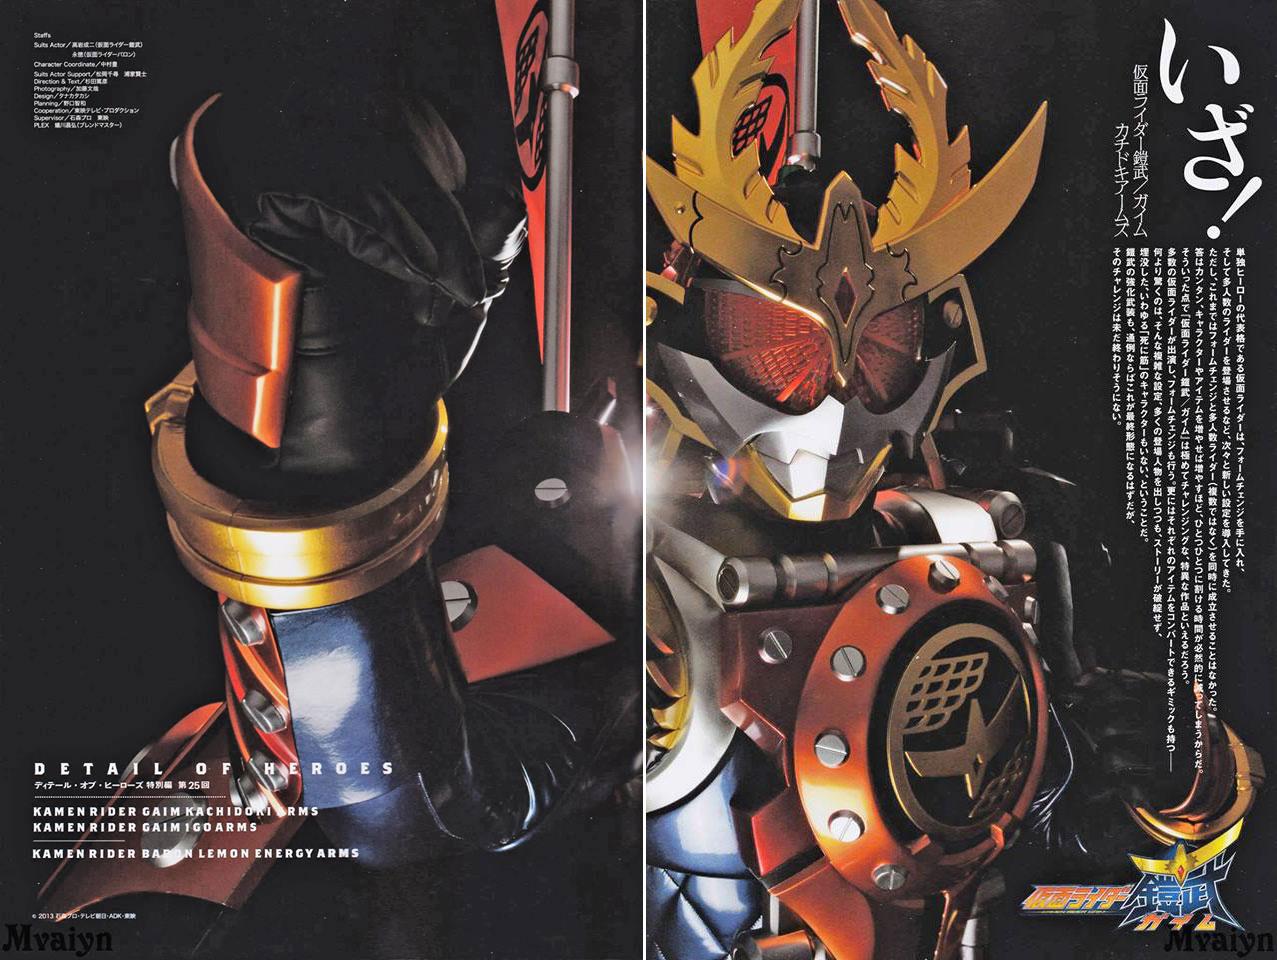 Kamen Rider Gaim - Kachidoki Arms (Image 7, 8) by Kamen ...